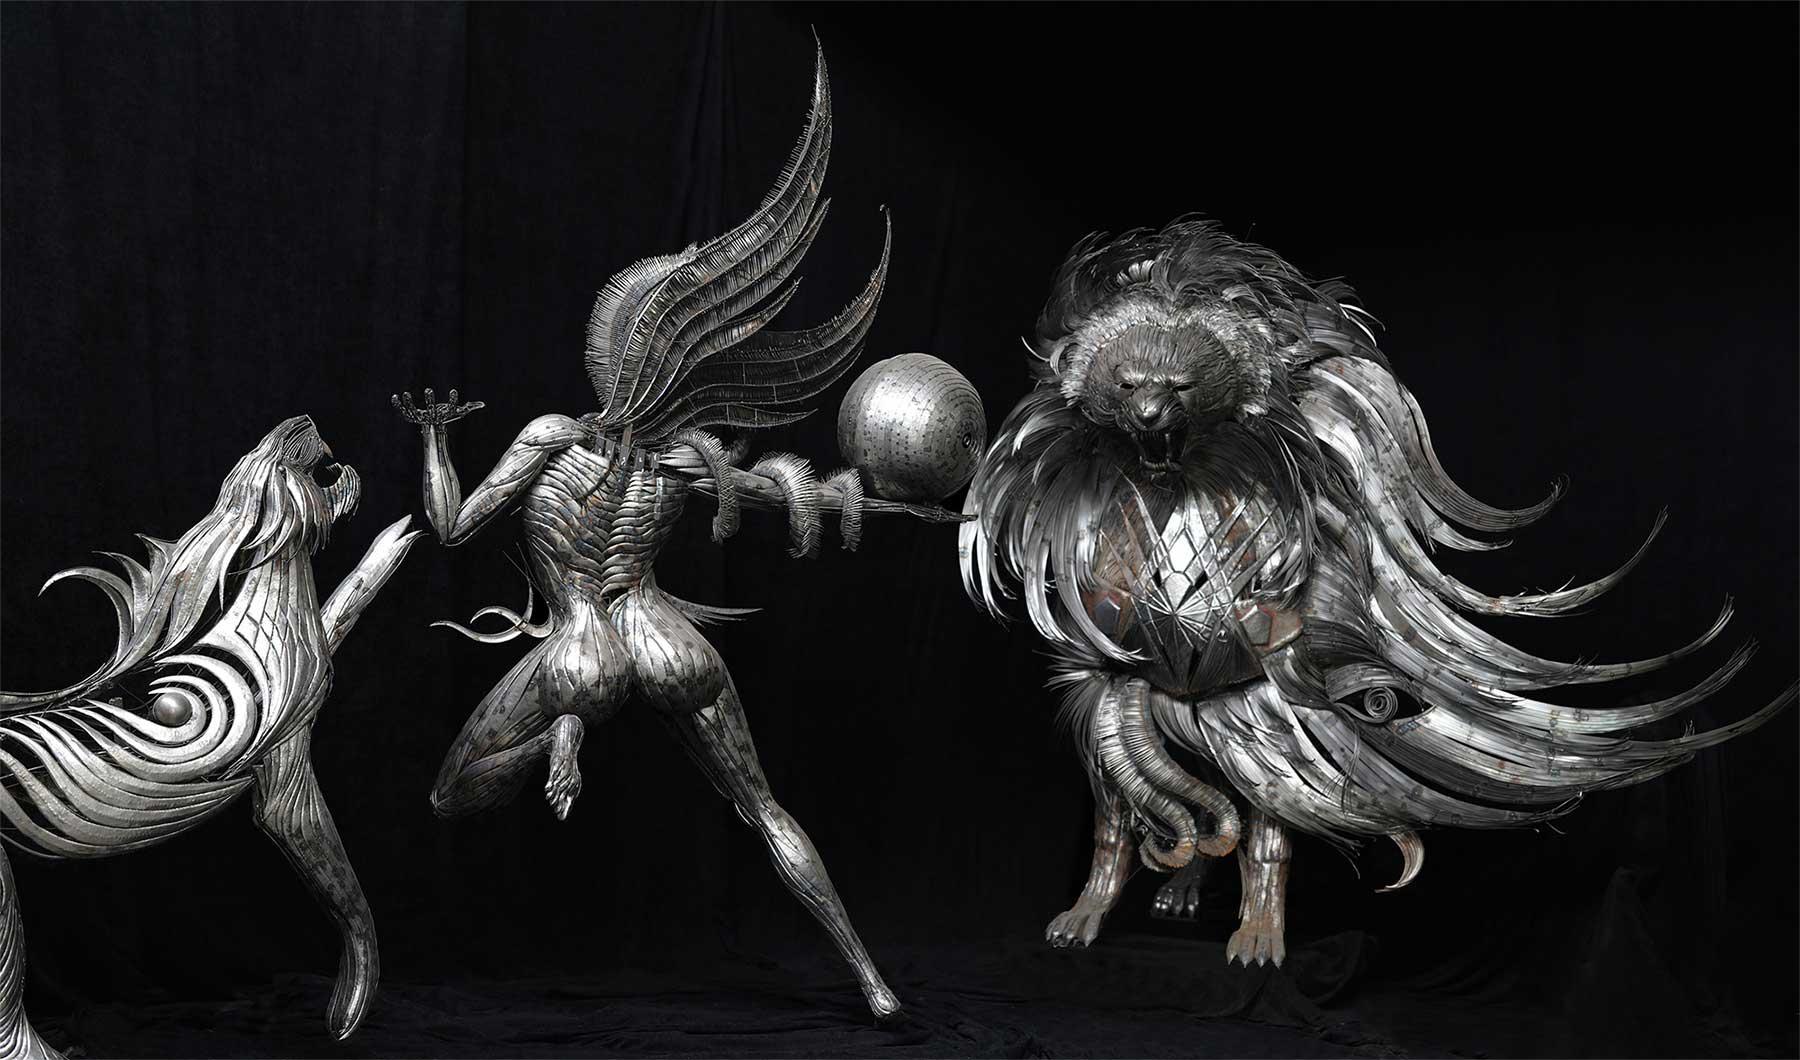 Geniale Altmetall-Skulpturen von Selçuk Yılmaz selcuk-yilmaz-metallskulpturen-2020_08